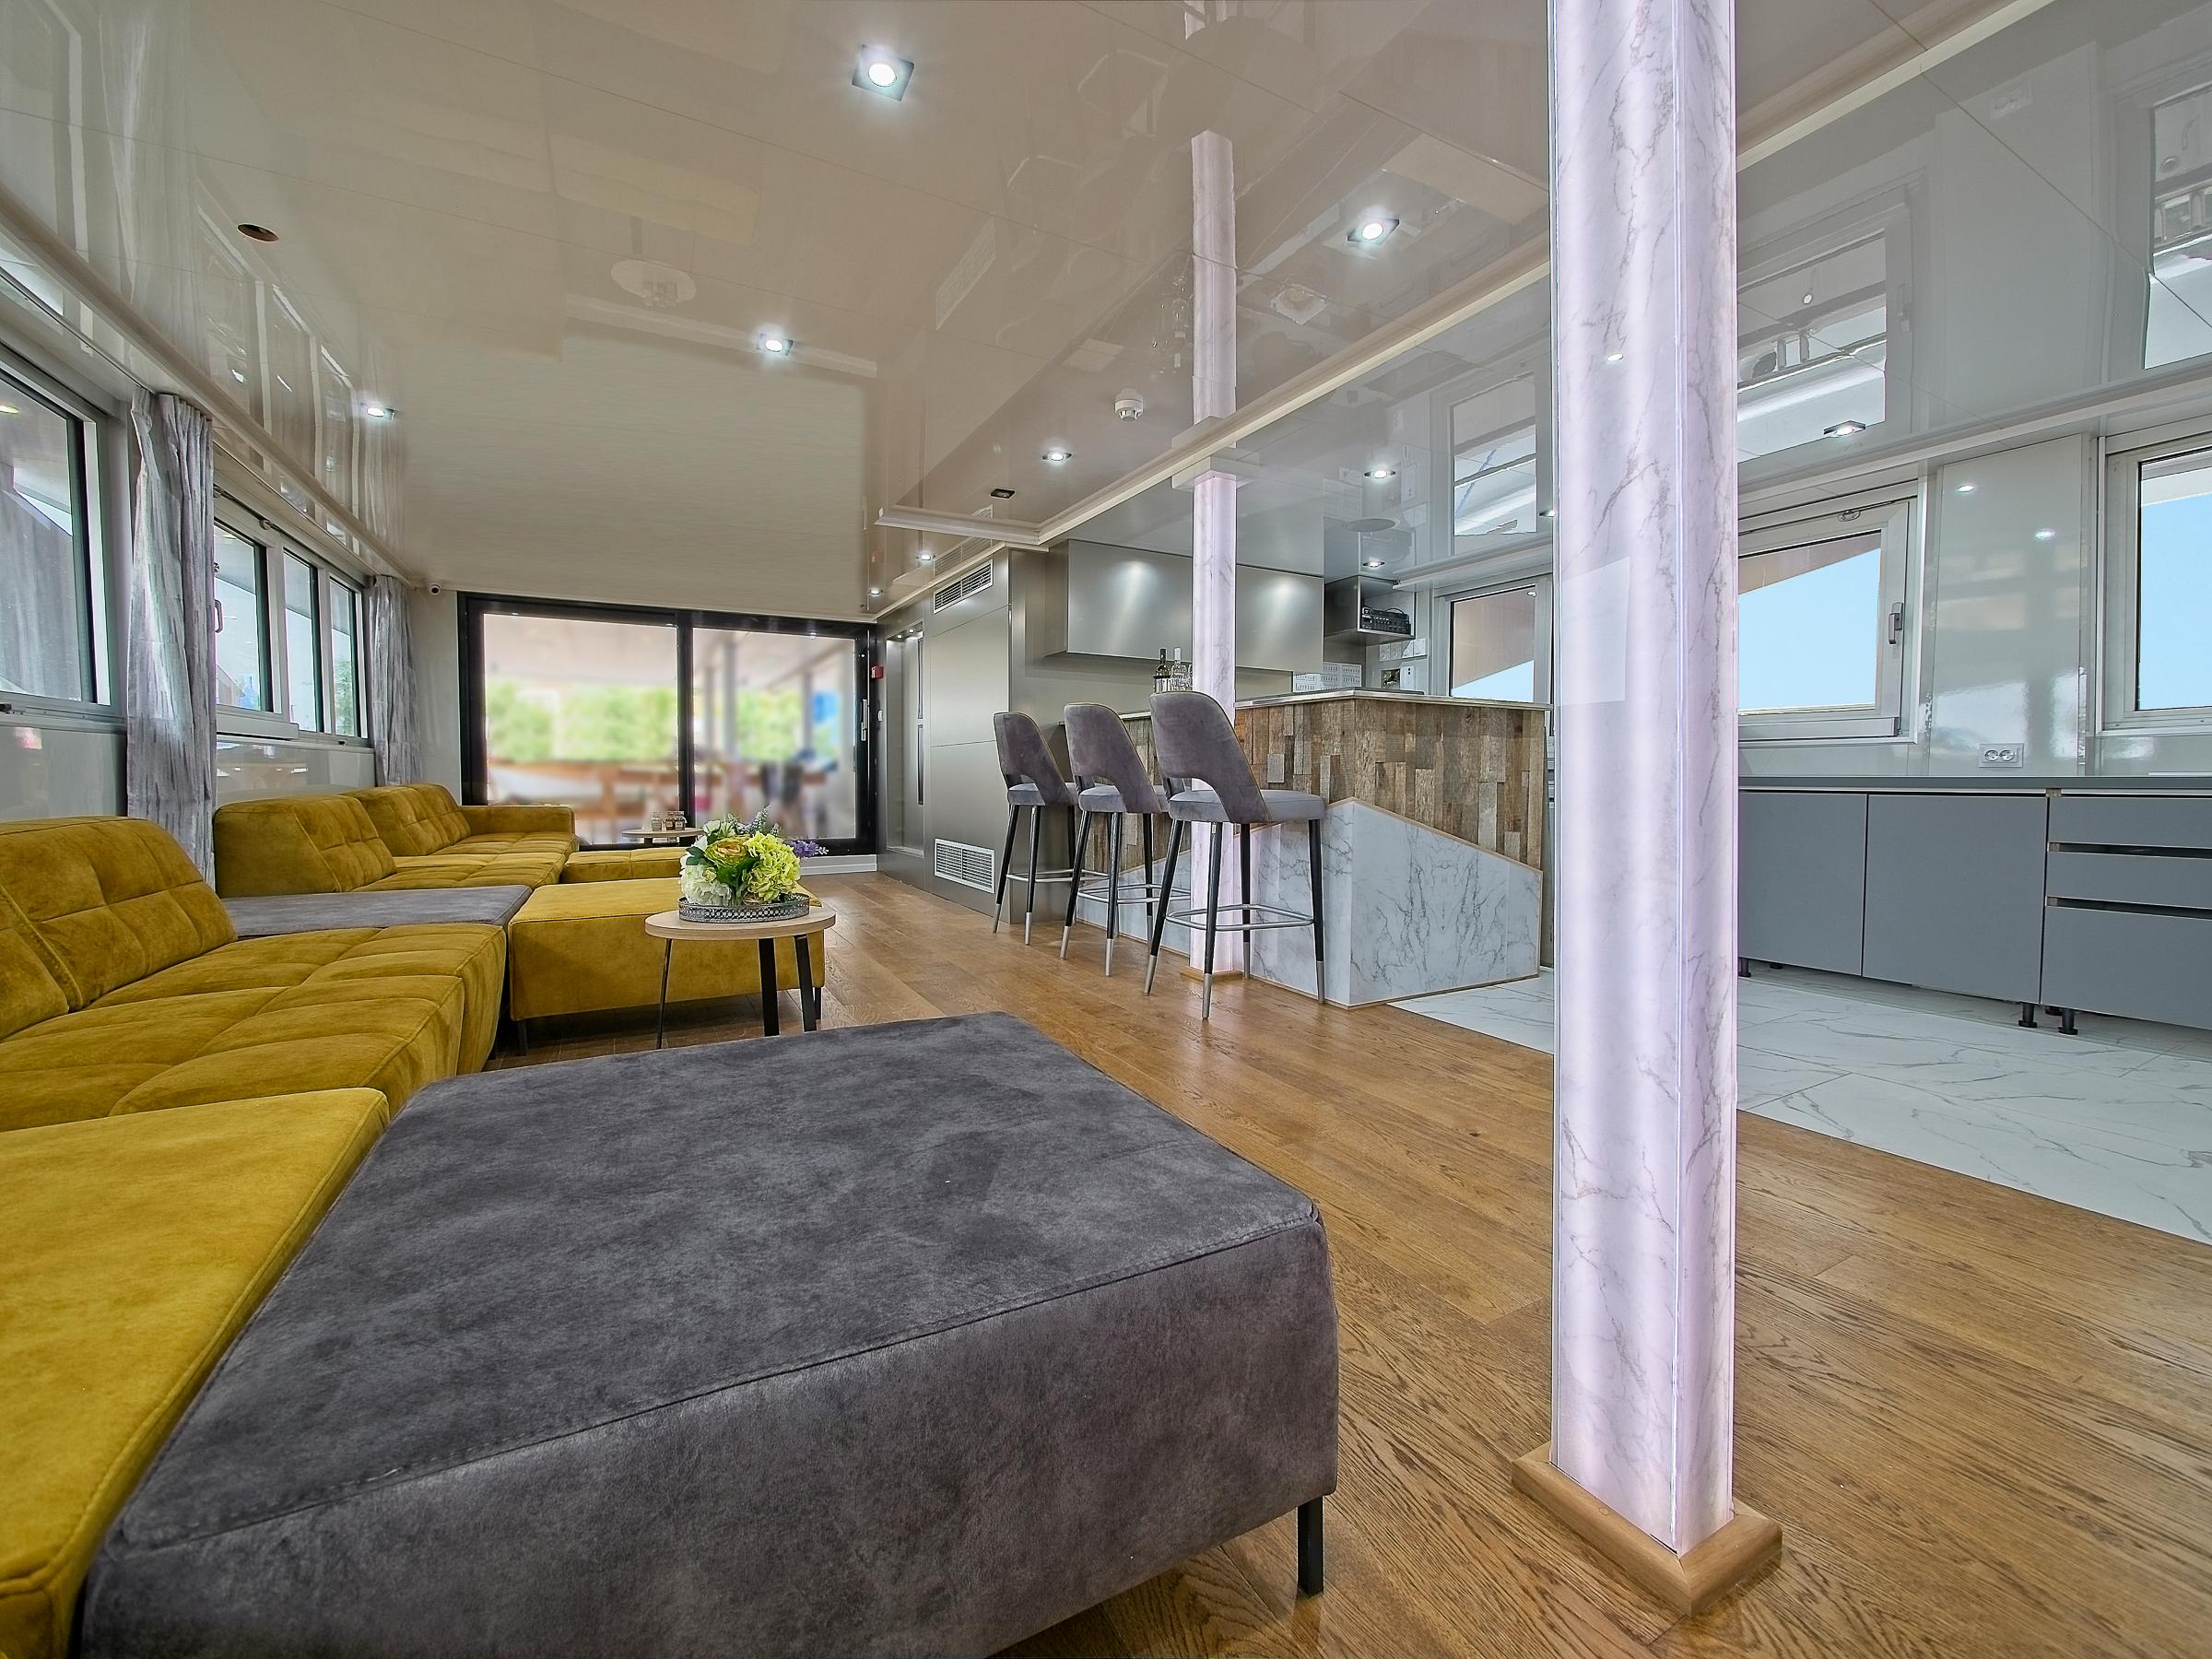 MS Premier Lounge